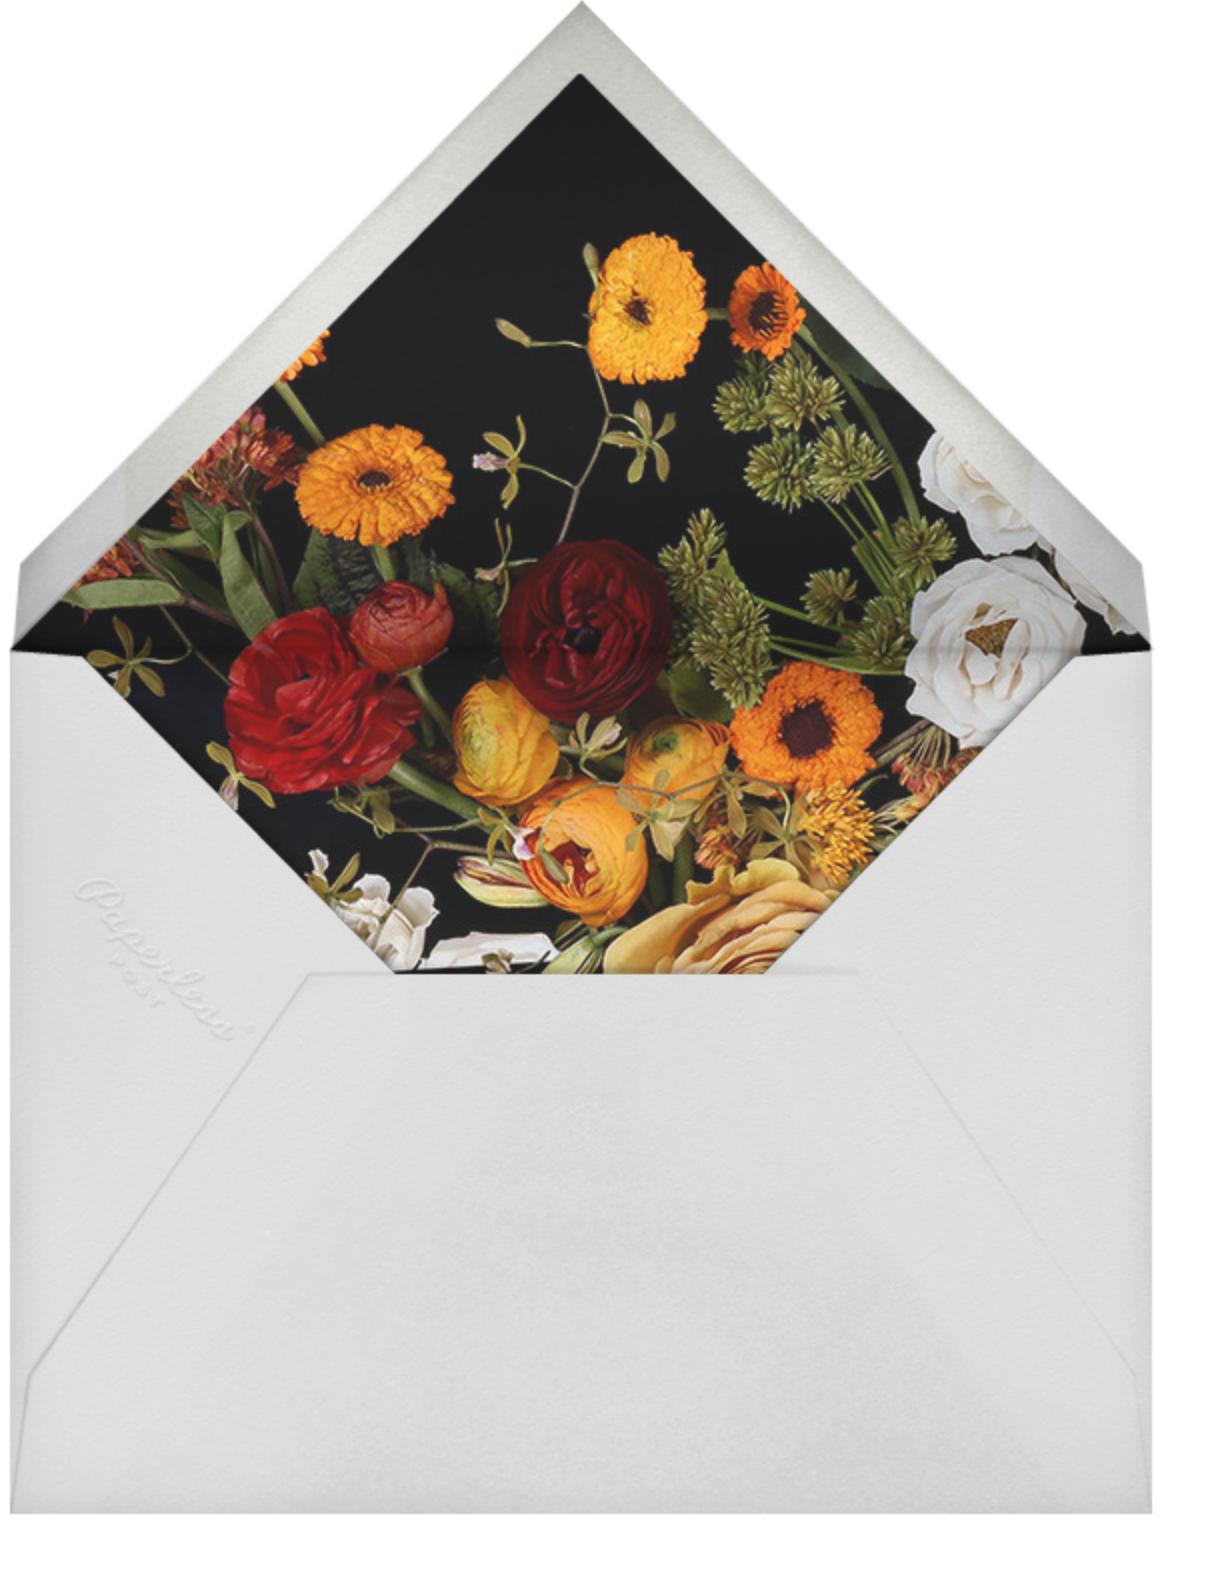 Vendémiaire (Save the Date) - Putnam & Putnam - Save the date - envelope back